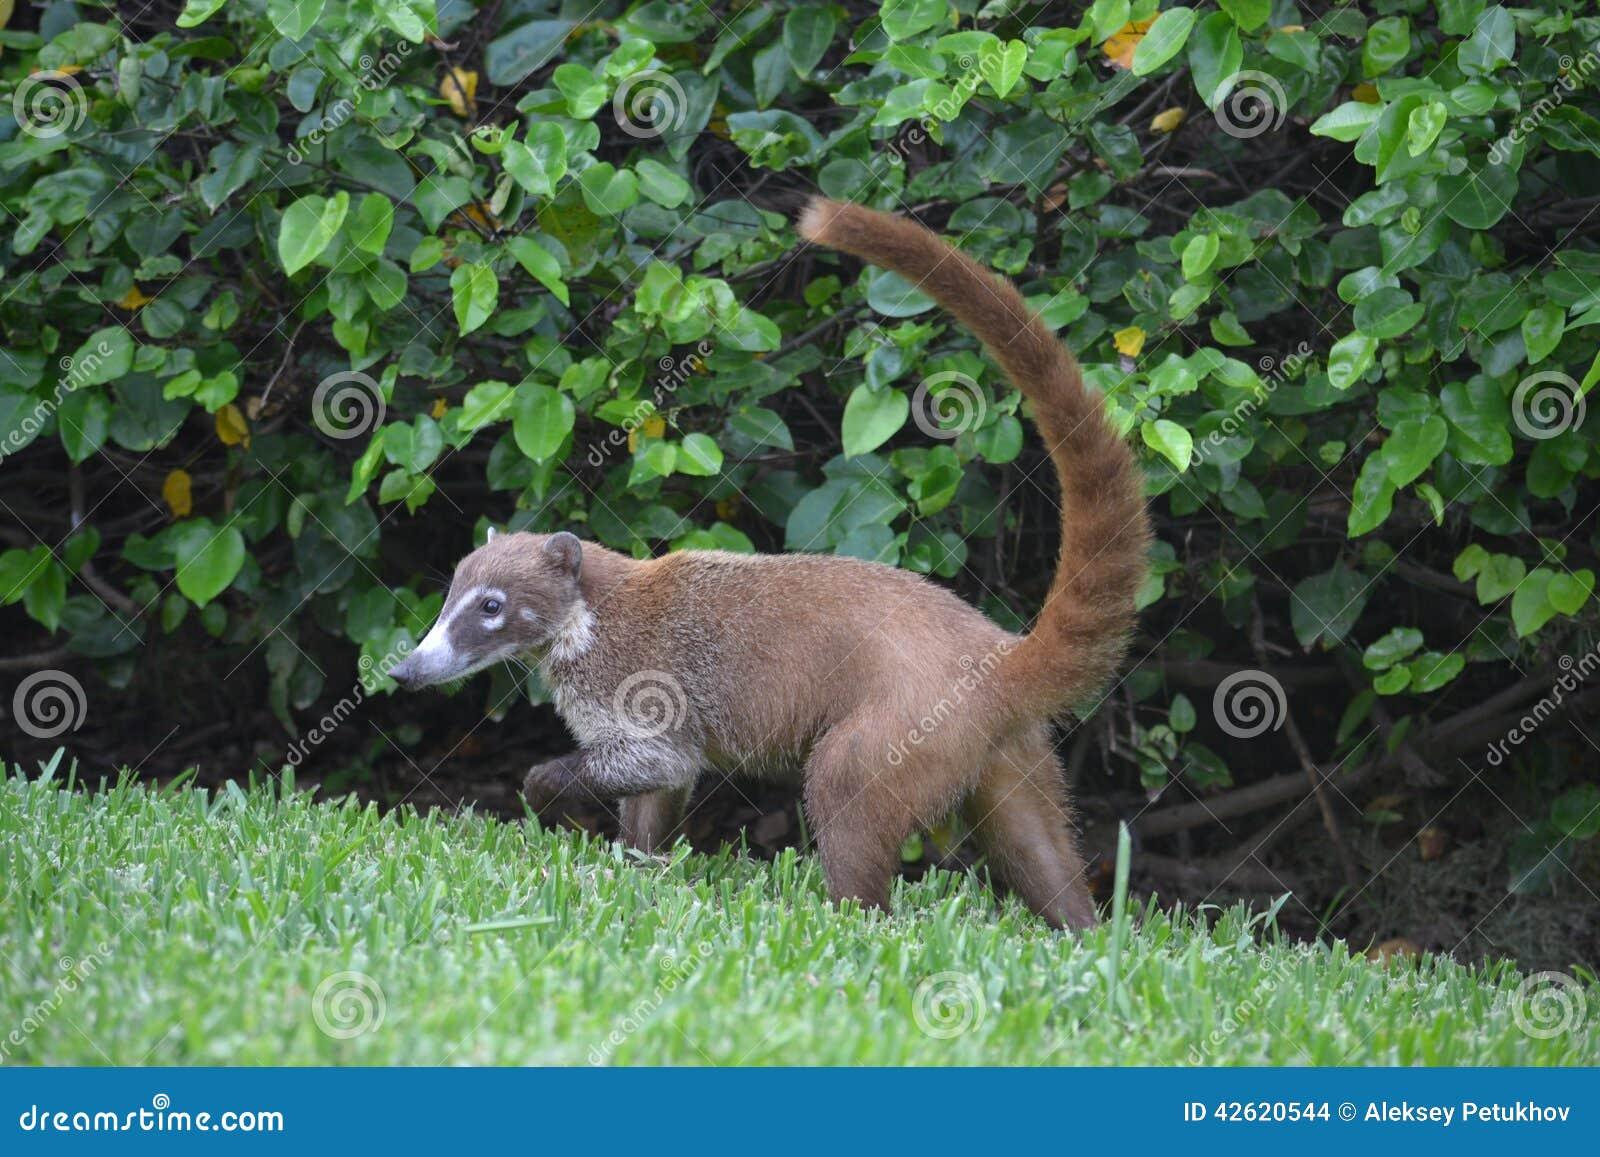 Coati Animals Fauna Exotic Yucatan Tropical Mexico Stock Photo - Image ...